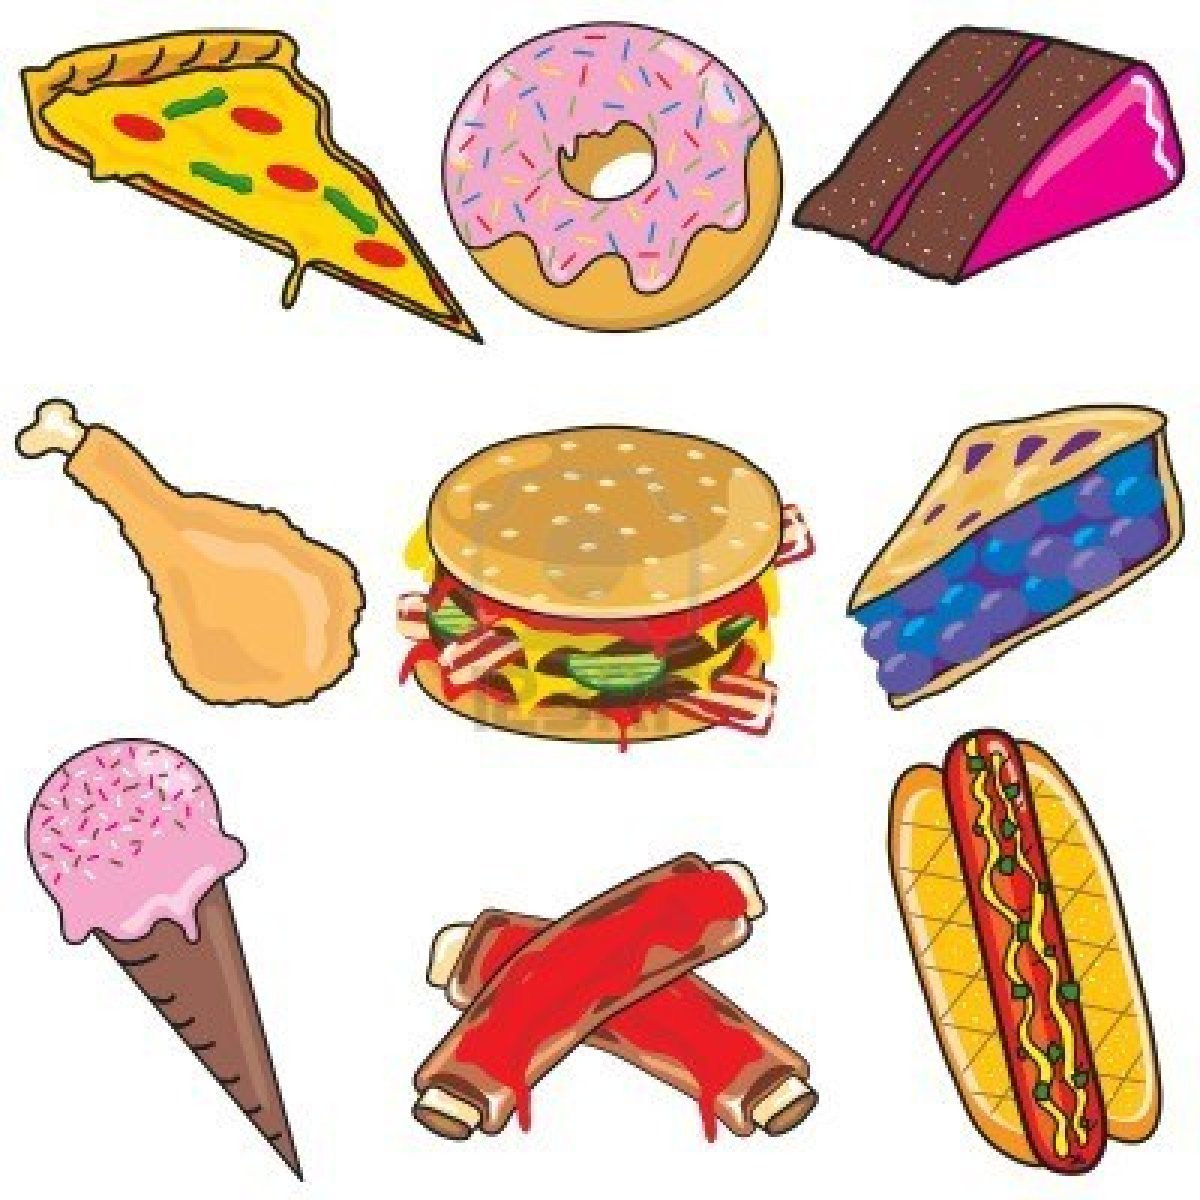 1200x1200 Food Images Clip Art Many Interesting Cliparts